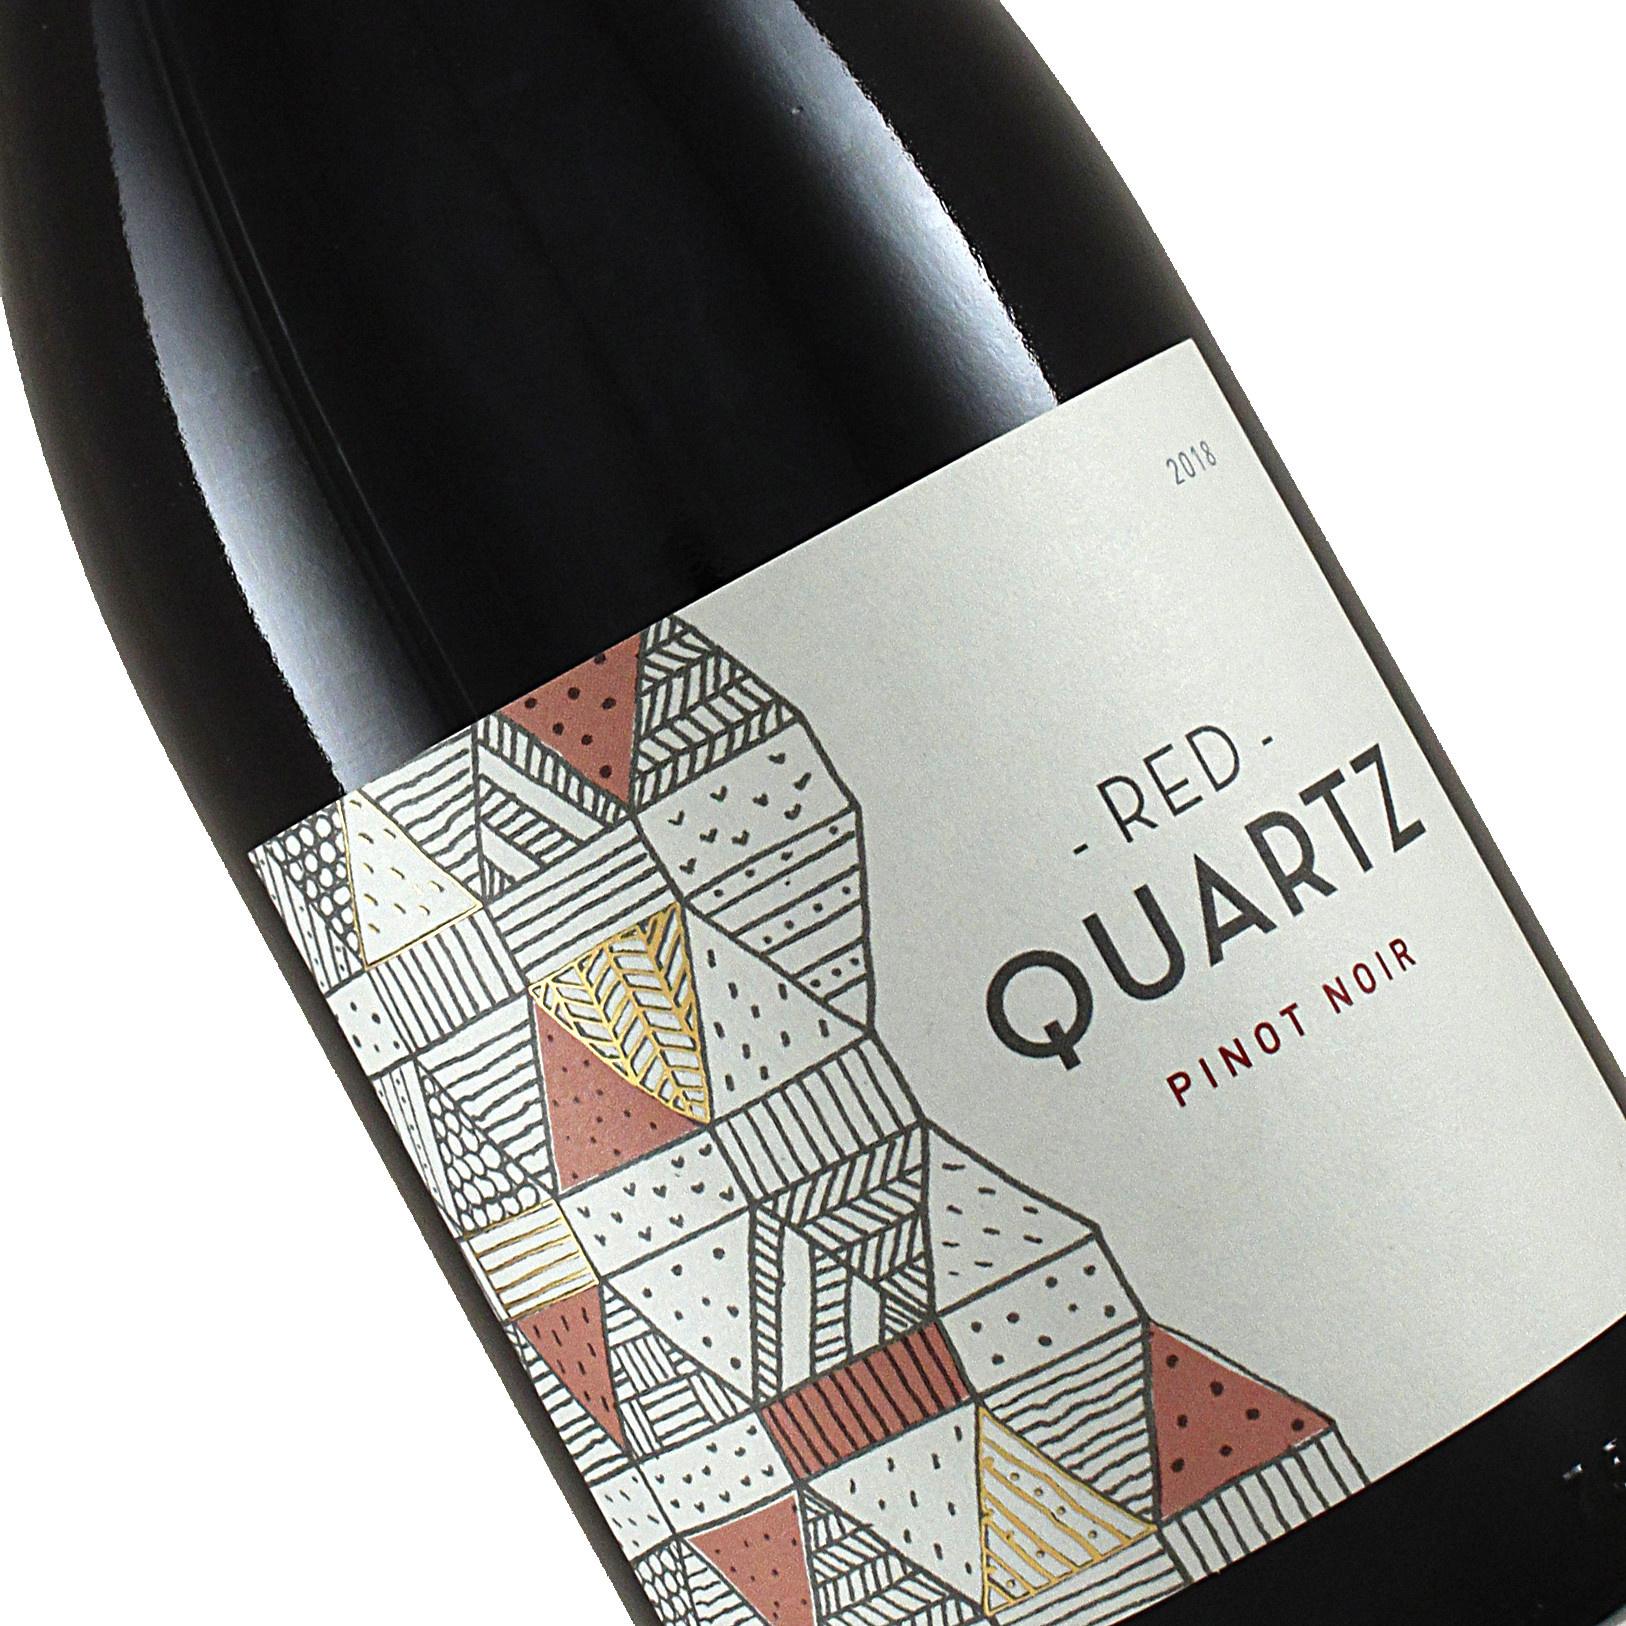 Transiego Wines 2018 Pinot Noir Red Quartz, Chile